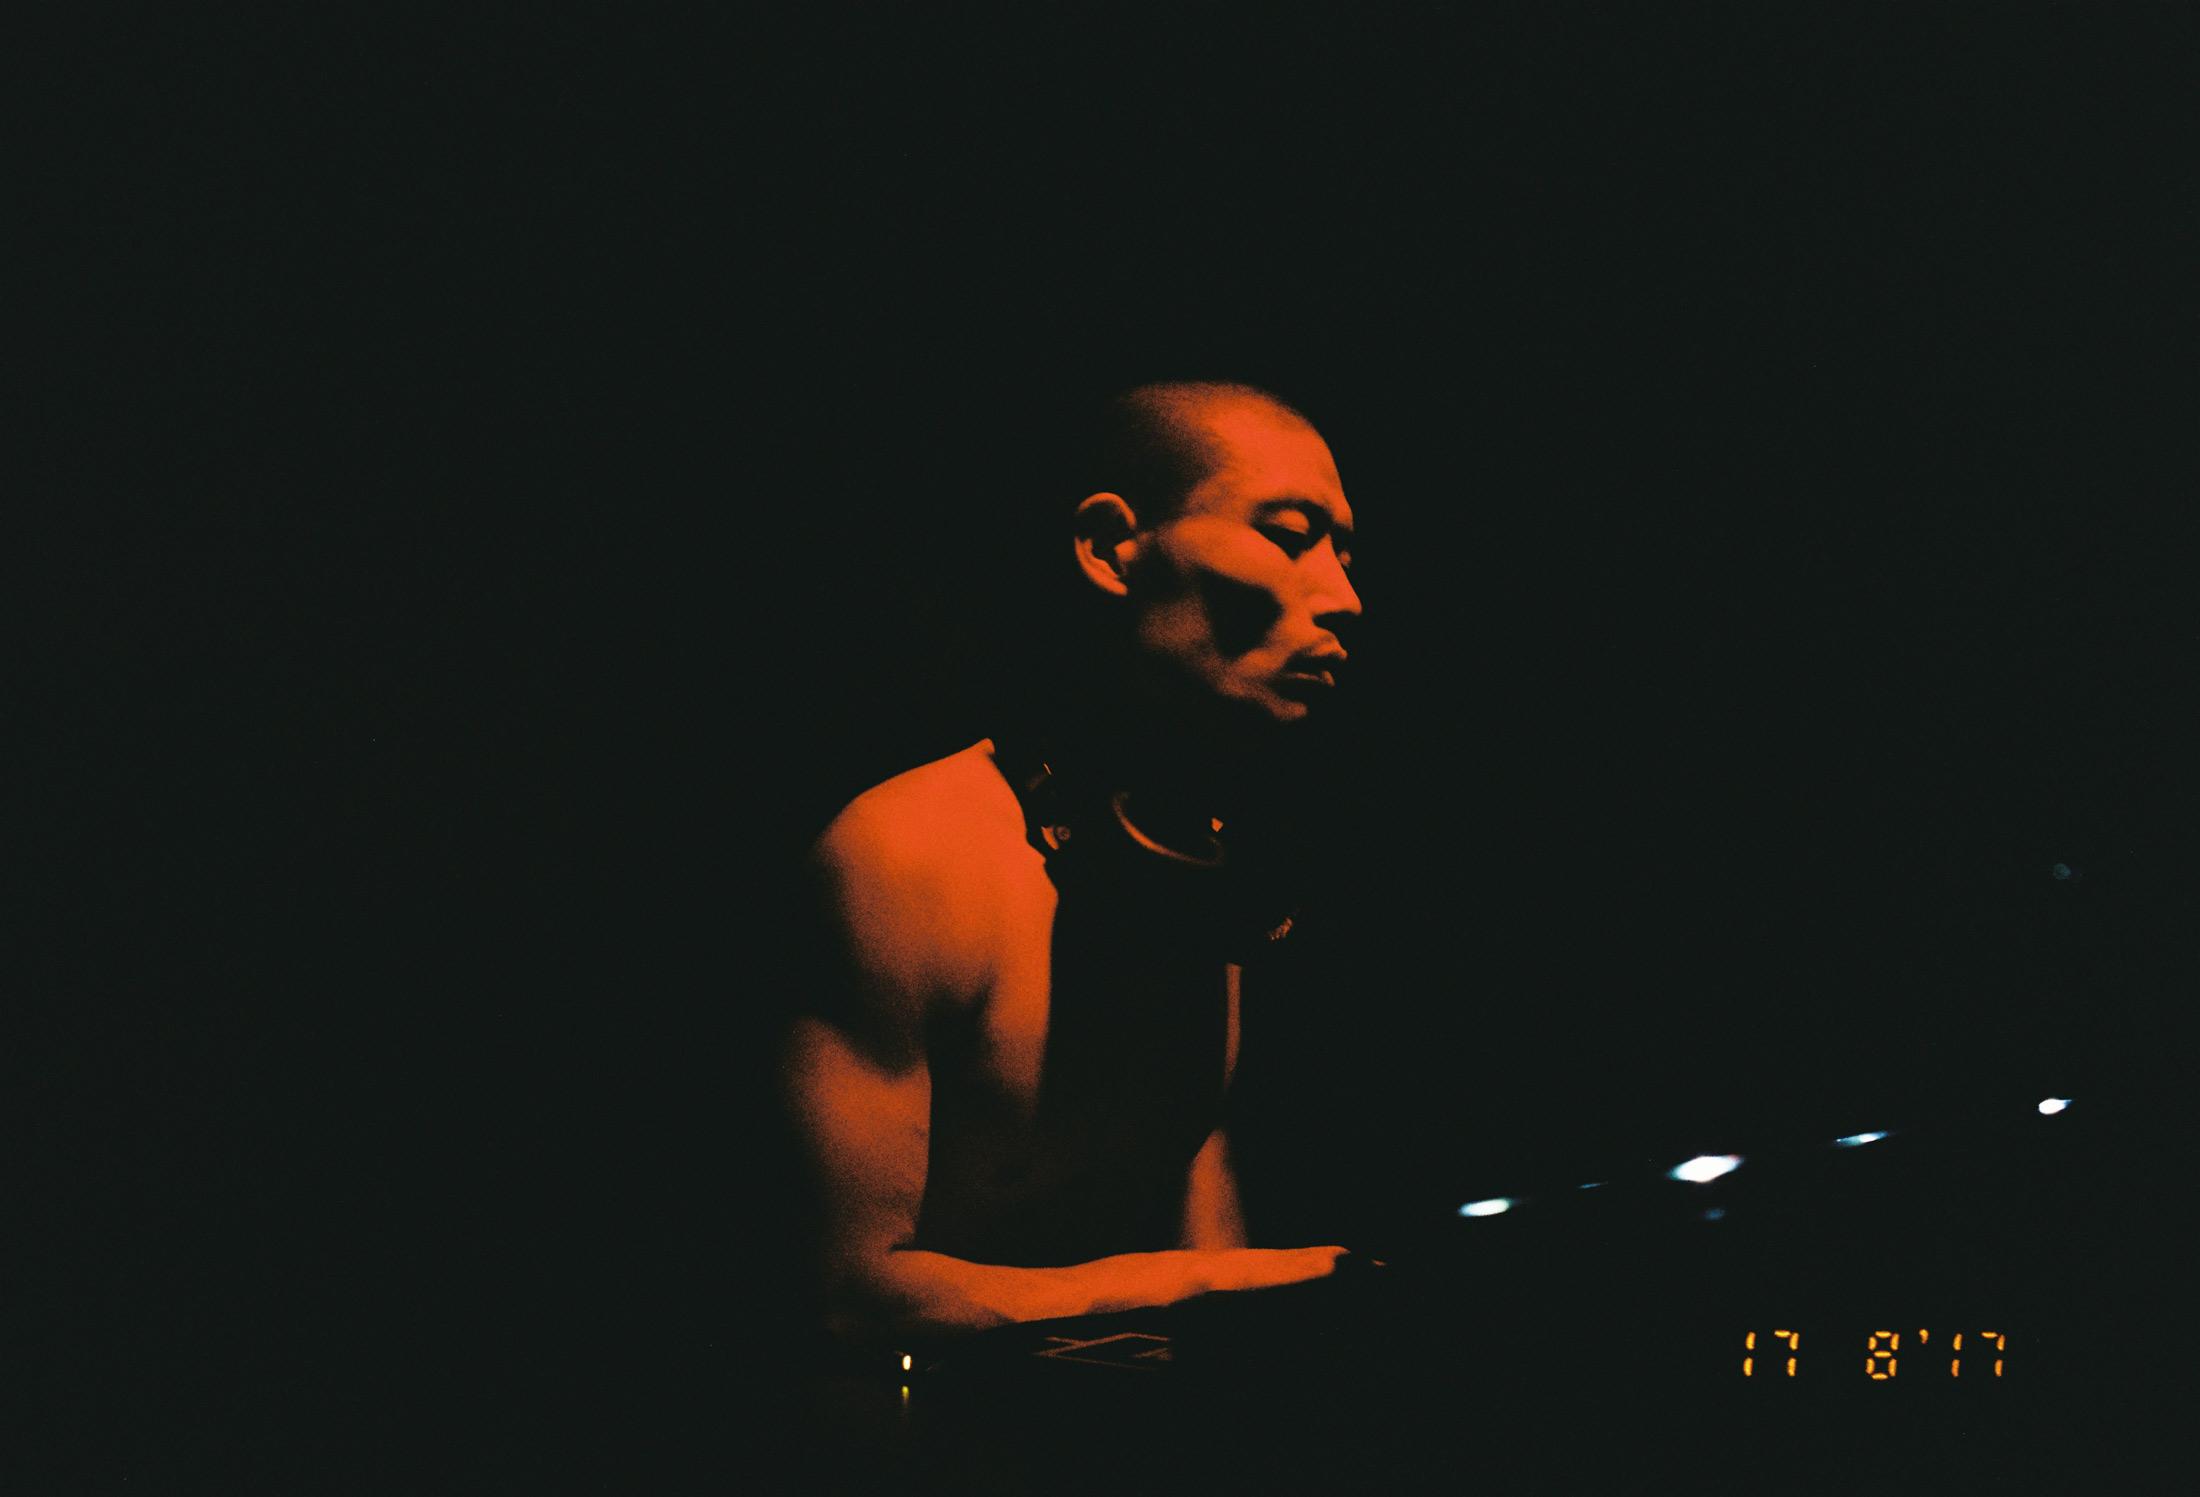 Yousuke Yukimatsu Berlin Underground Techno Tresor Ohm Rave Nightlife